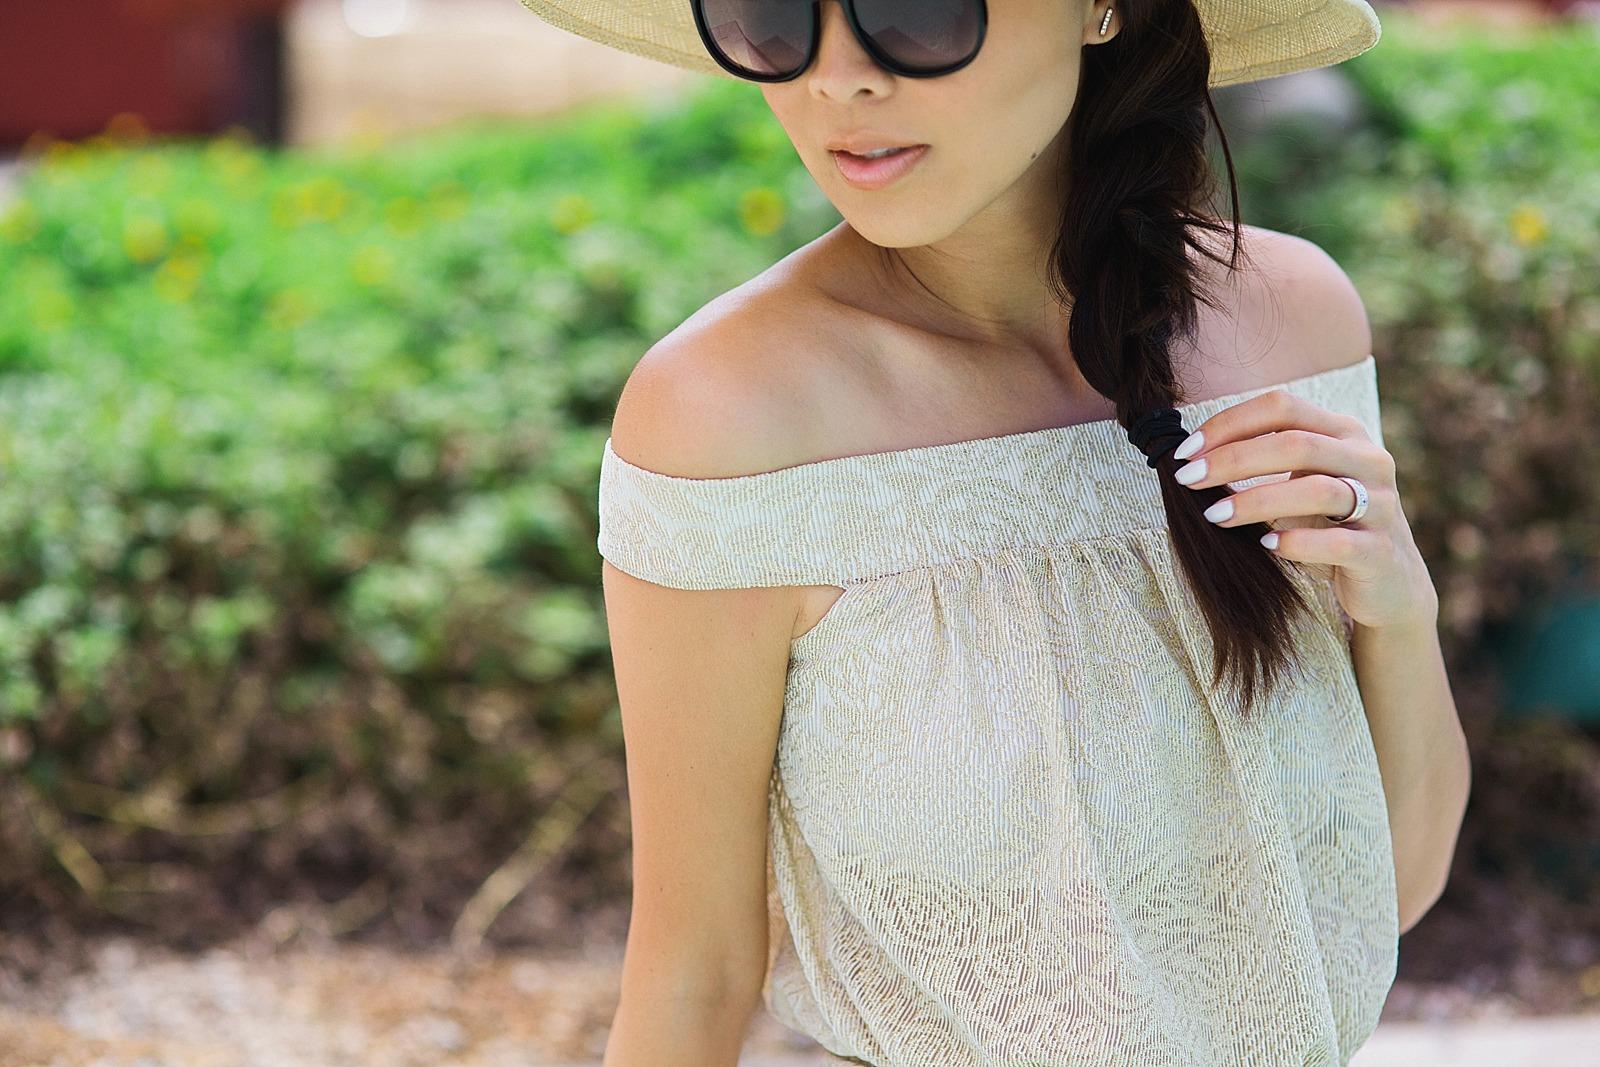 off-shoulder-bikini-riot-swimsuit-casino-del-sol-diana-elizabeth-blog-lifestyle-blogger-style_0046